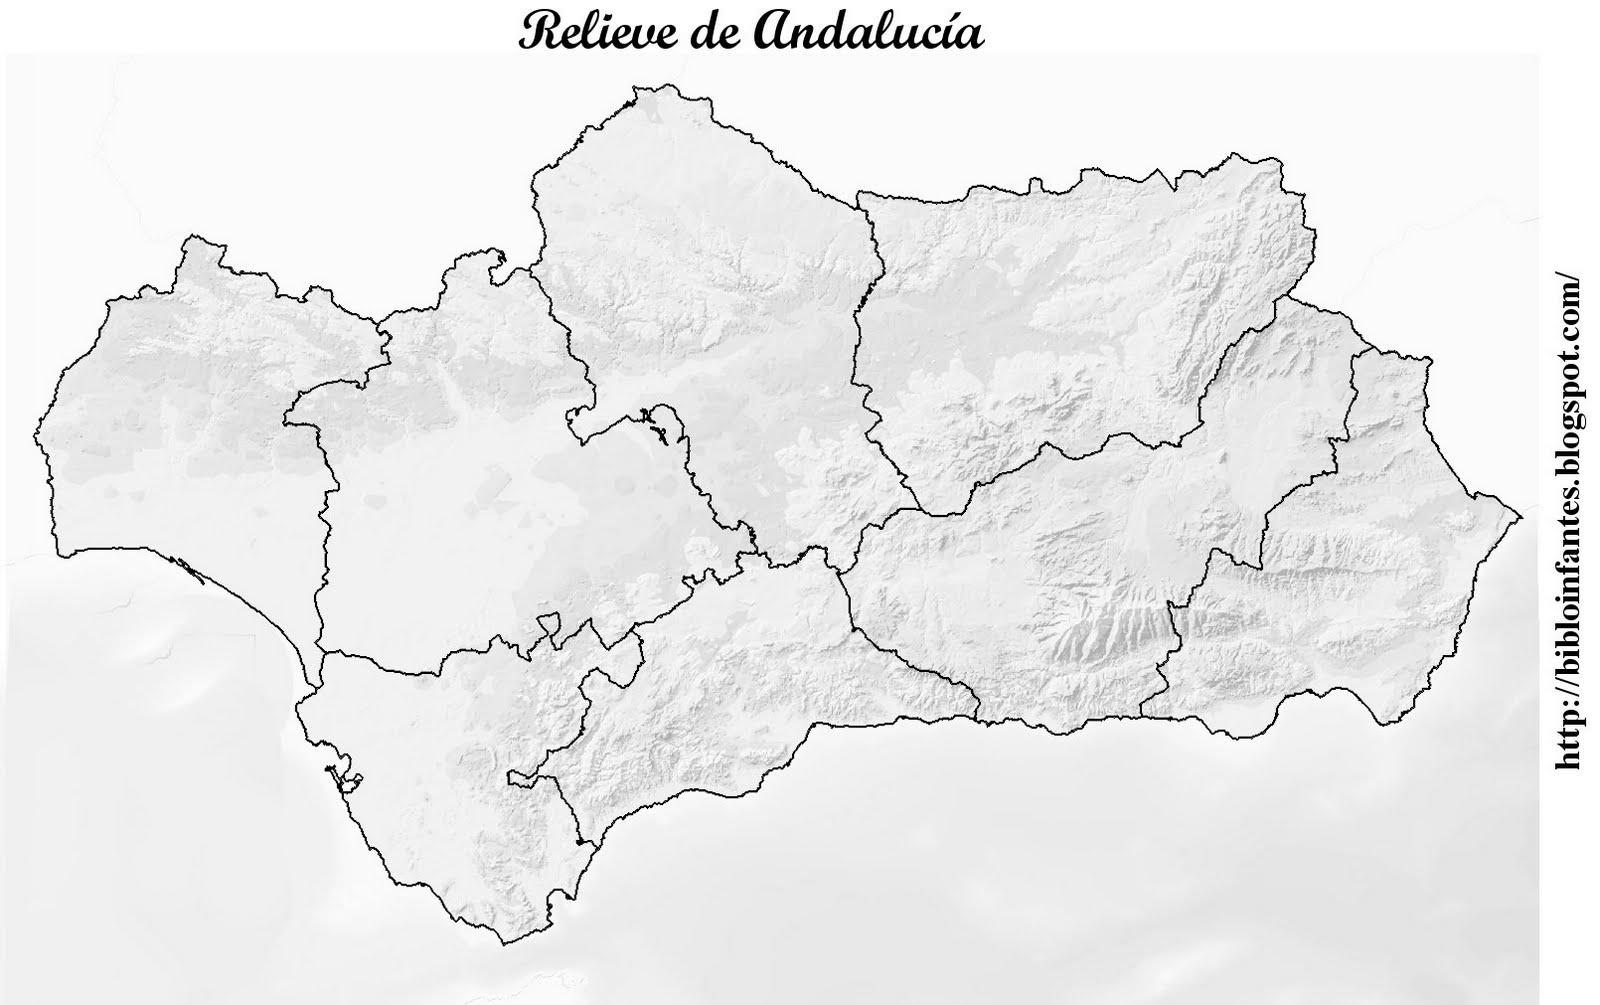 http://www.juntadeandalucia.es/averroes/html/adjuntos/2007/09/12/0066/index.html